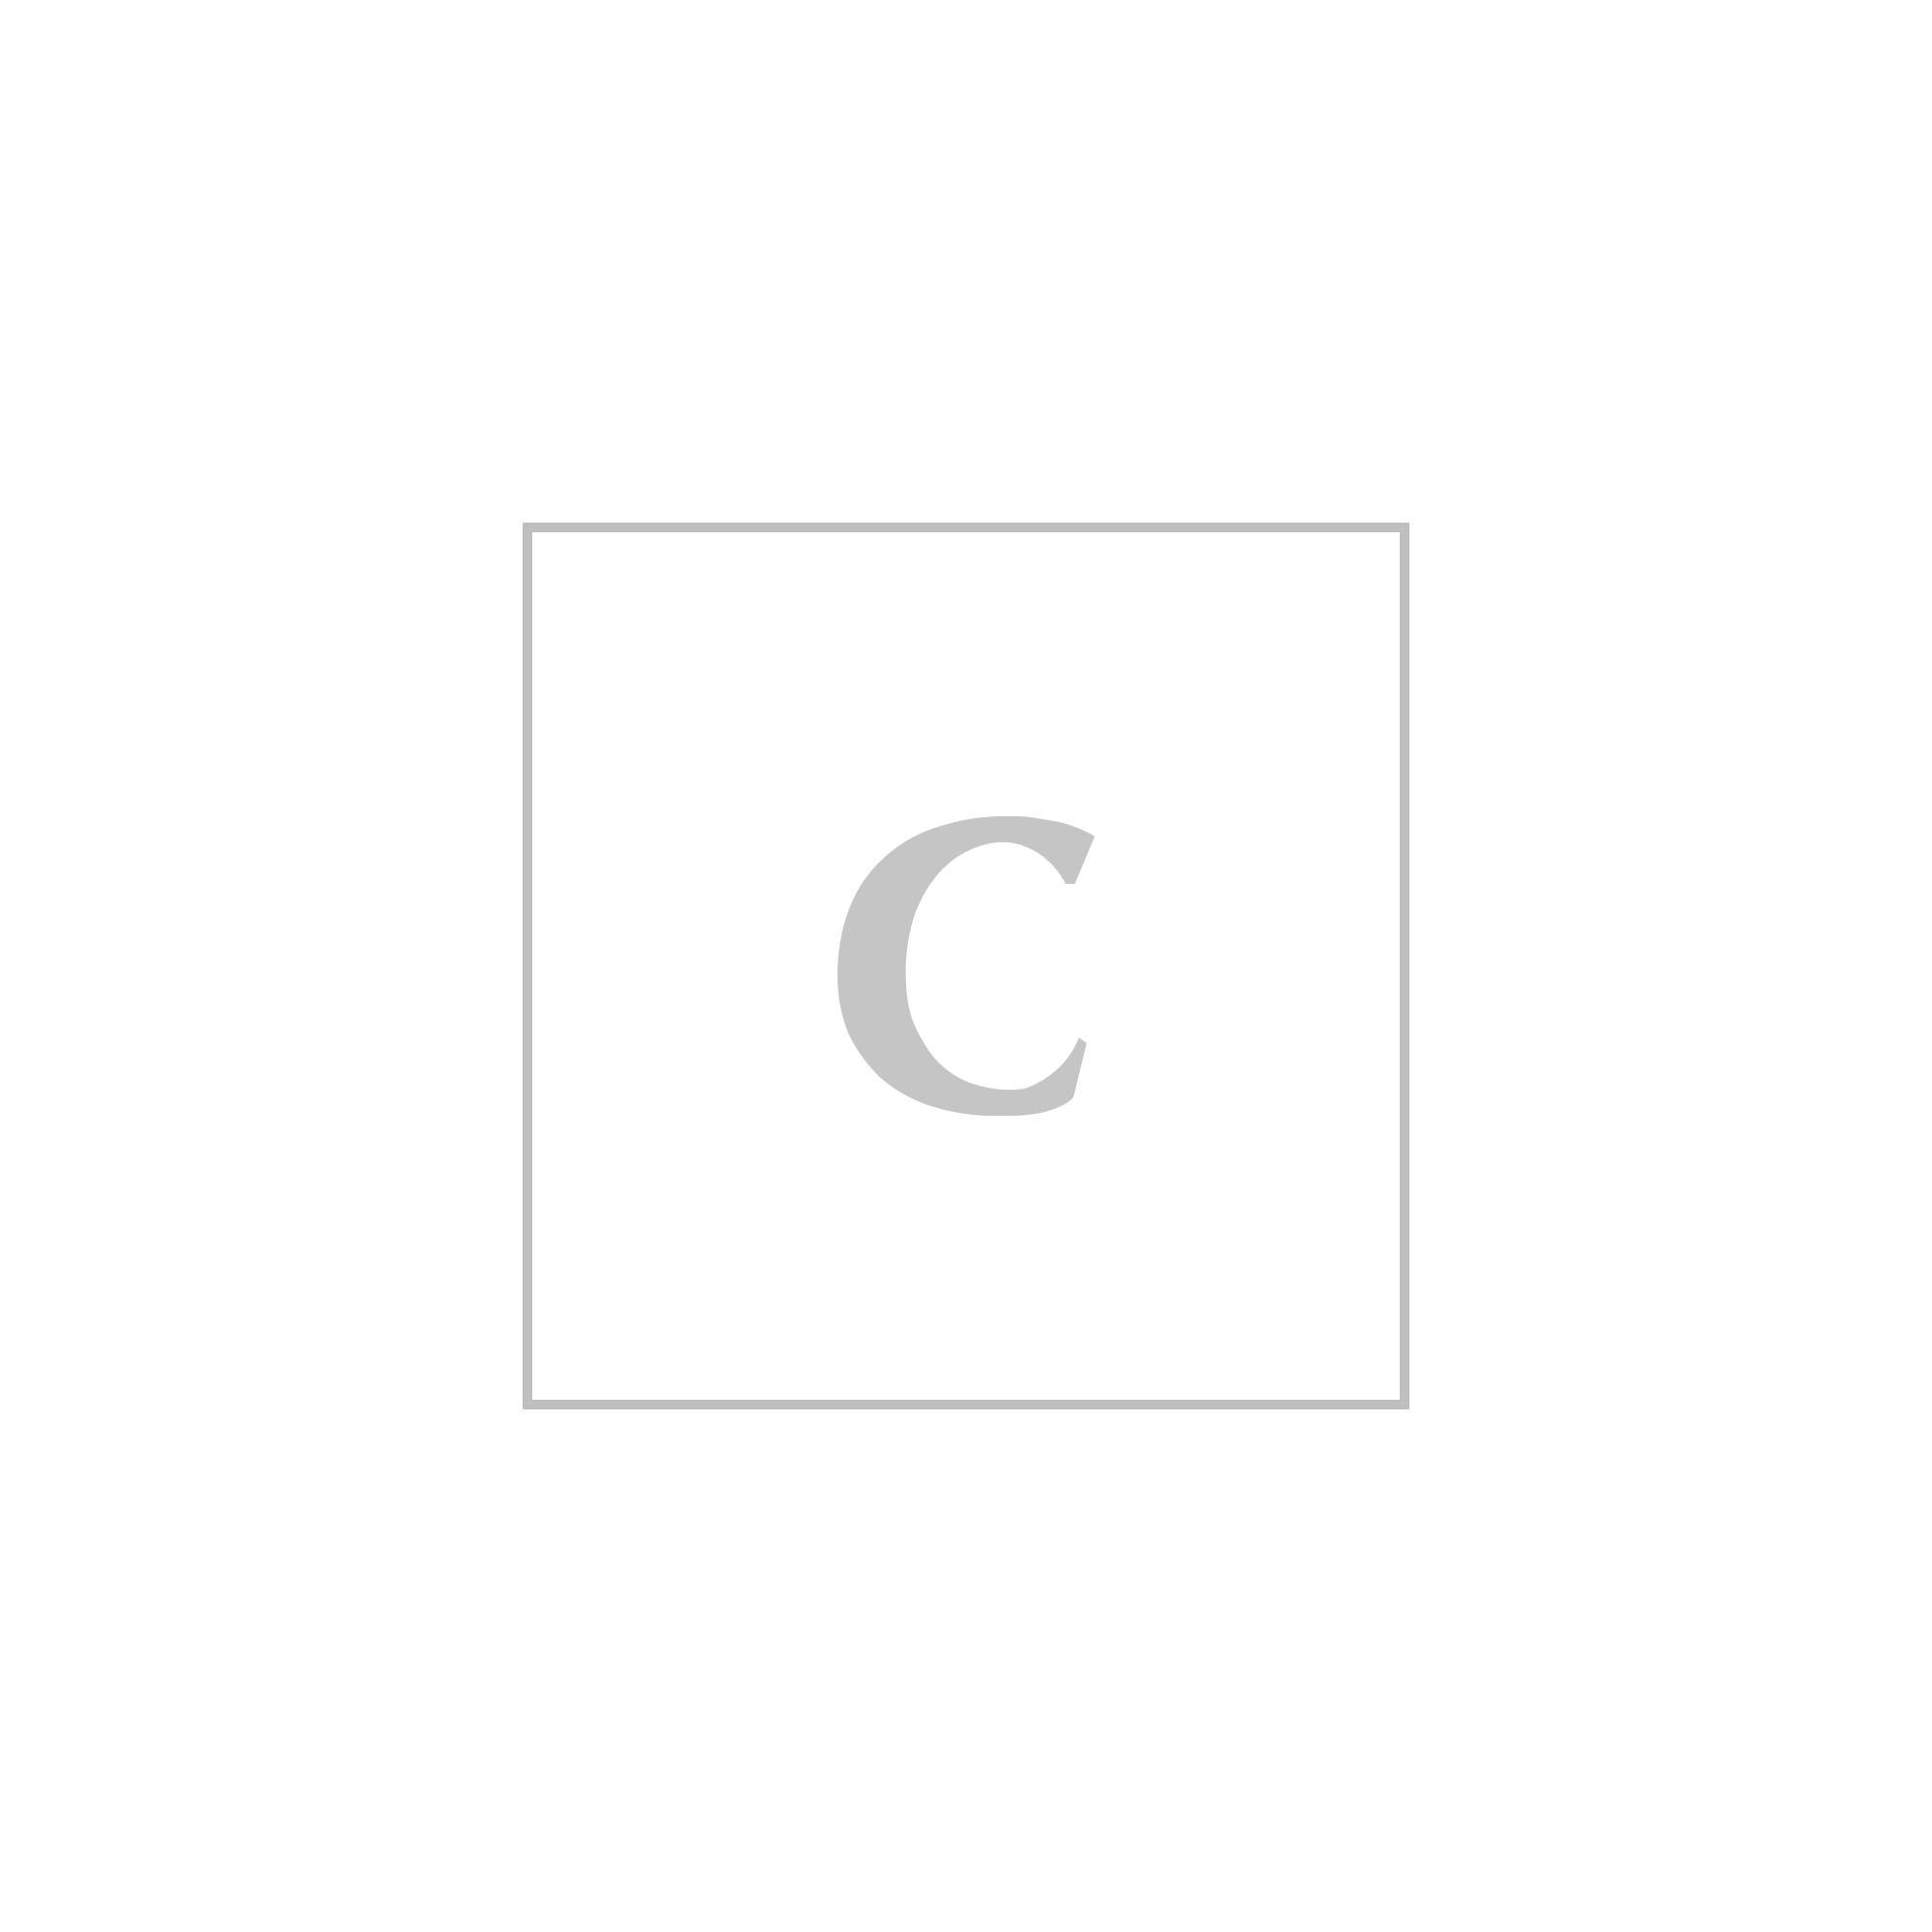 Lanvin rectangular bag in calfskin